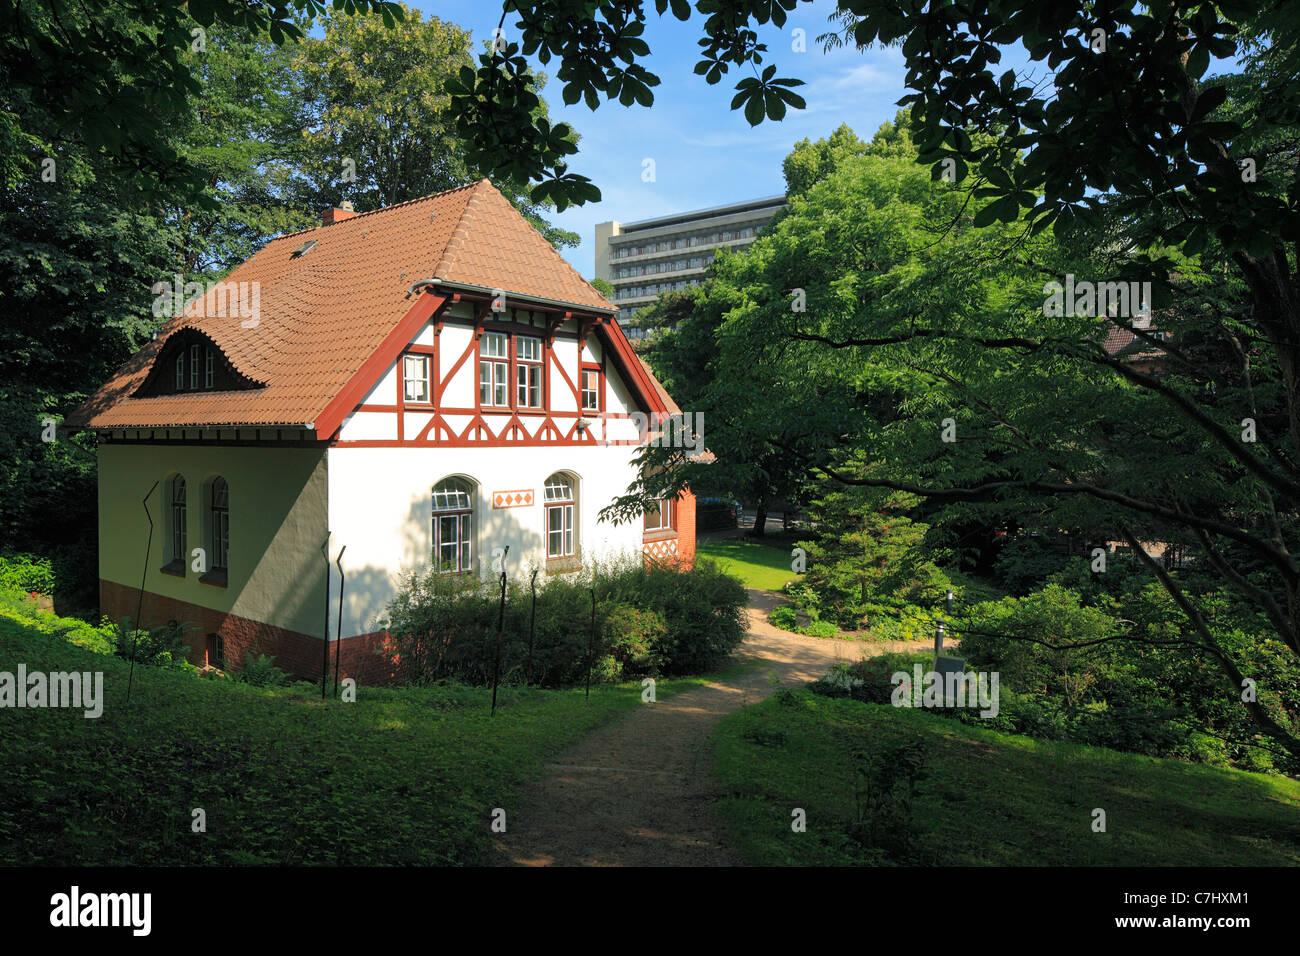 Alter Botanischer Garten Kiel: Literaturhaus Stock Photos & Literaturhaus Stock Images